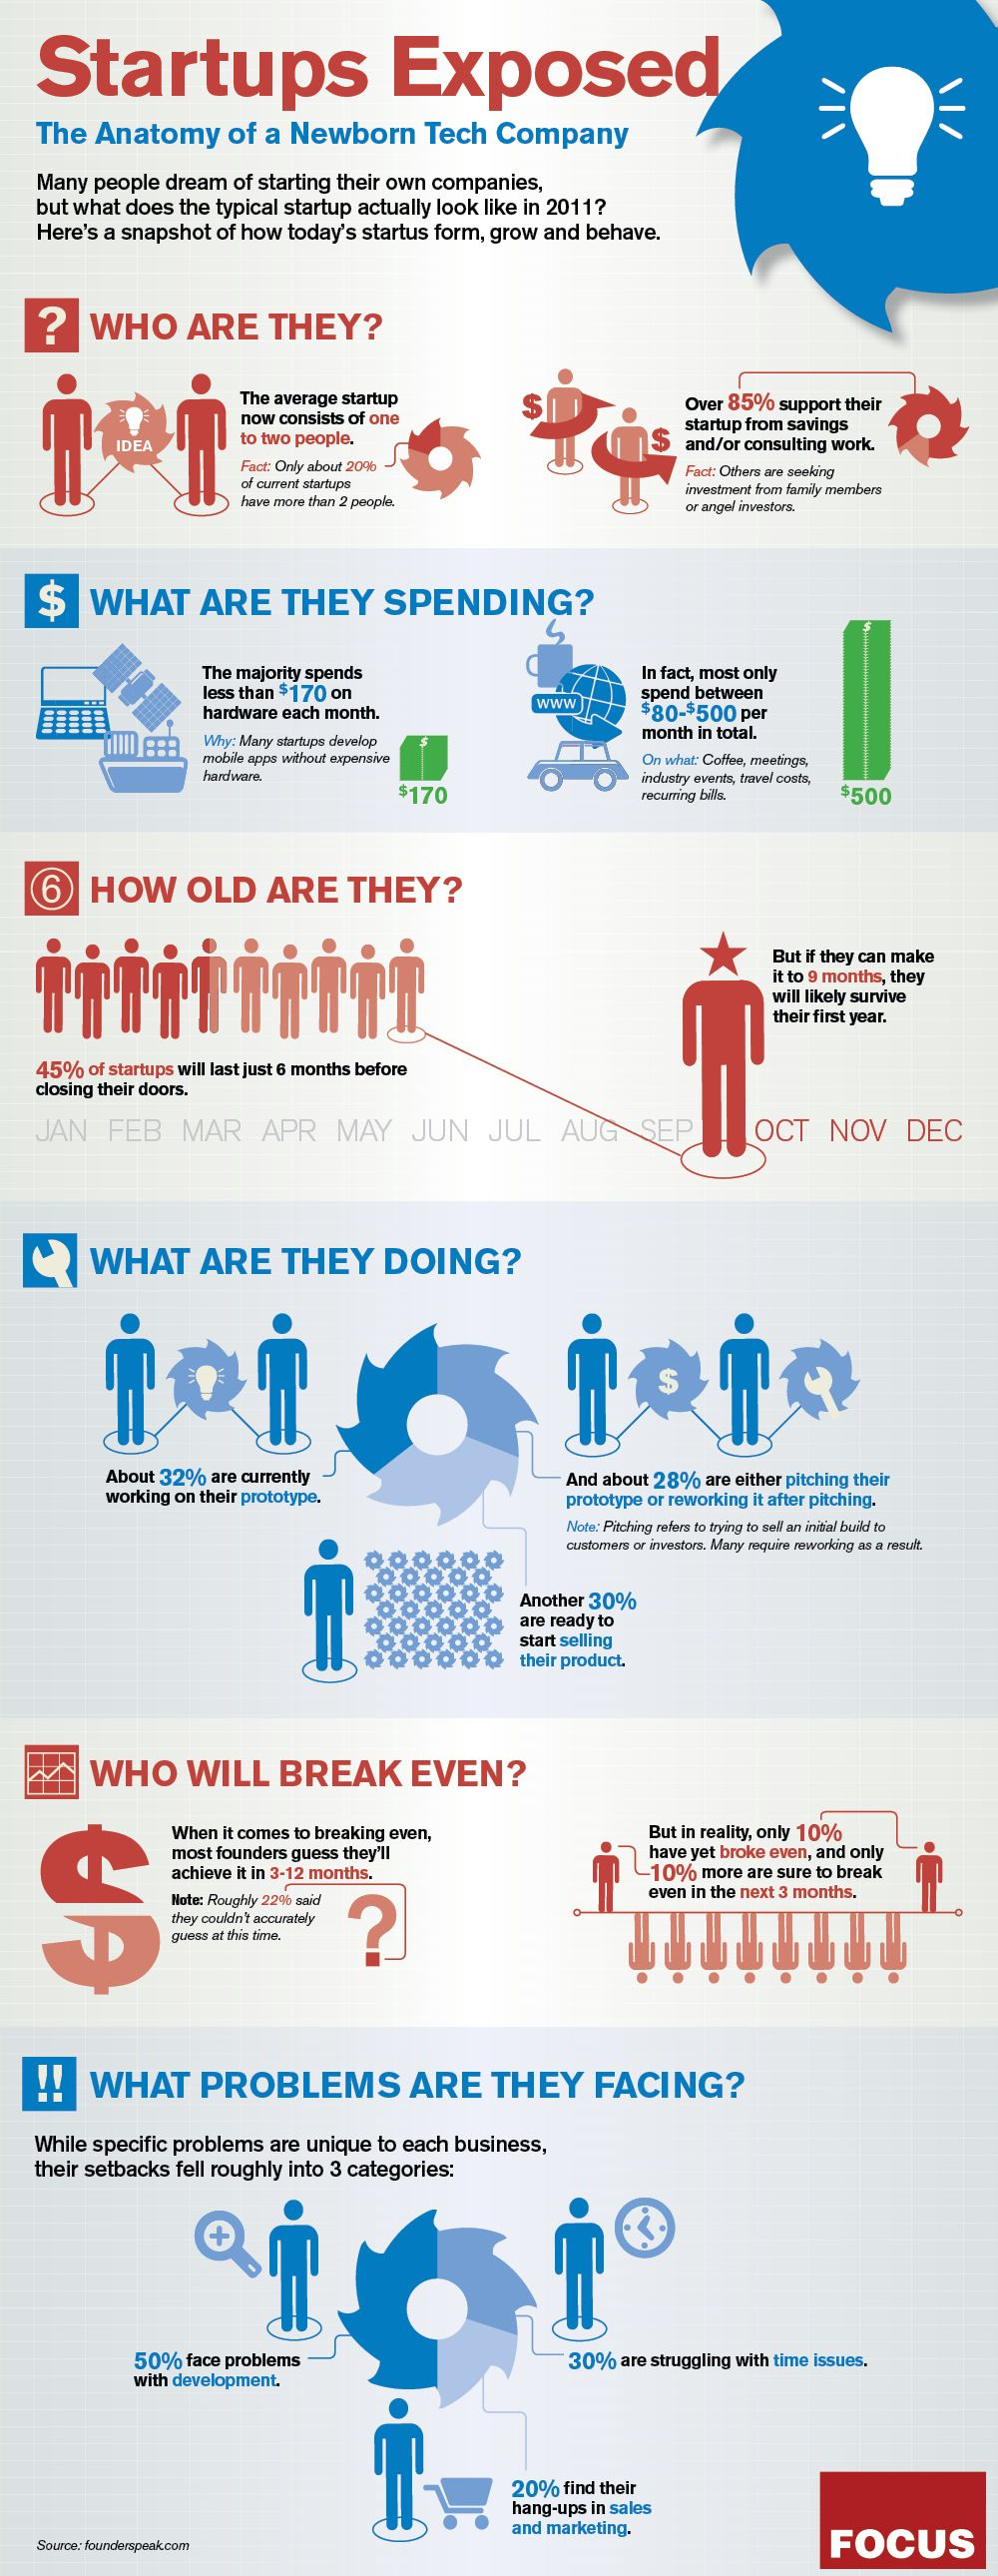 Infographie] Anatomie des nouvelles startups | Pinterest | Startups ...